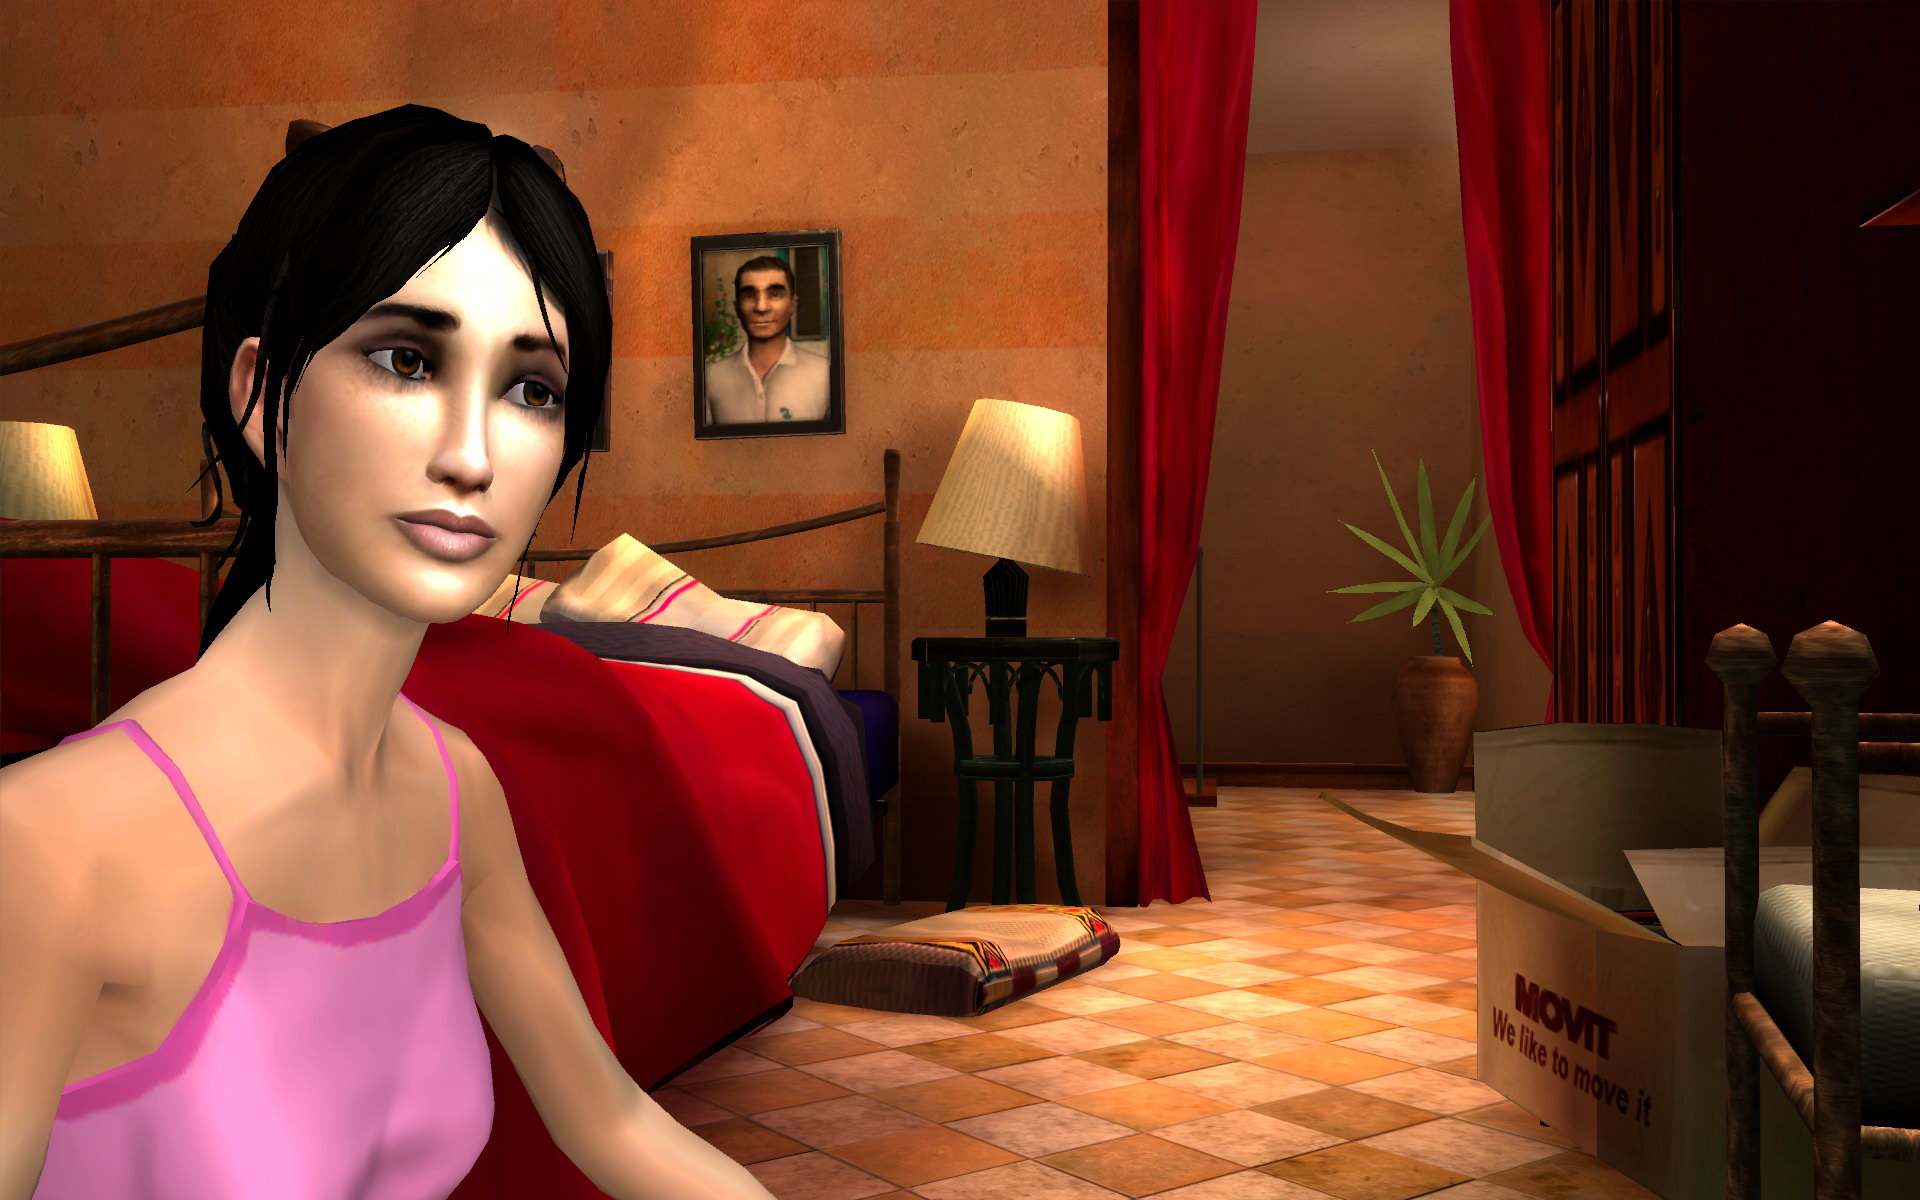 Dreamfall nude zoe mod textmod sexy videos